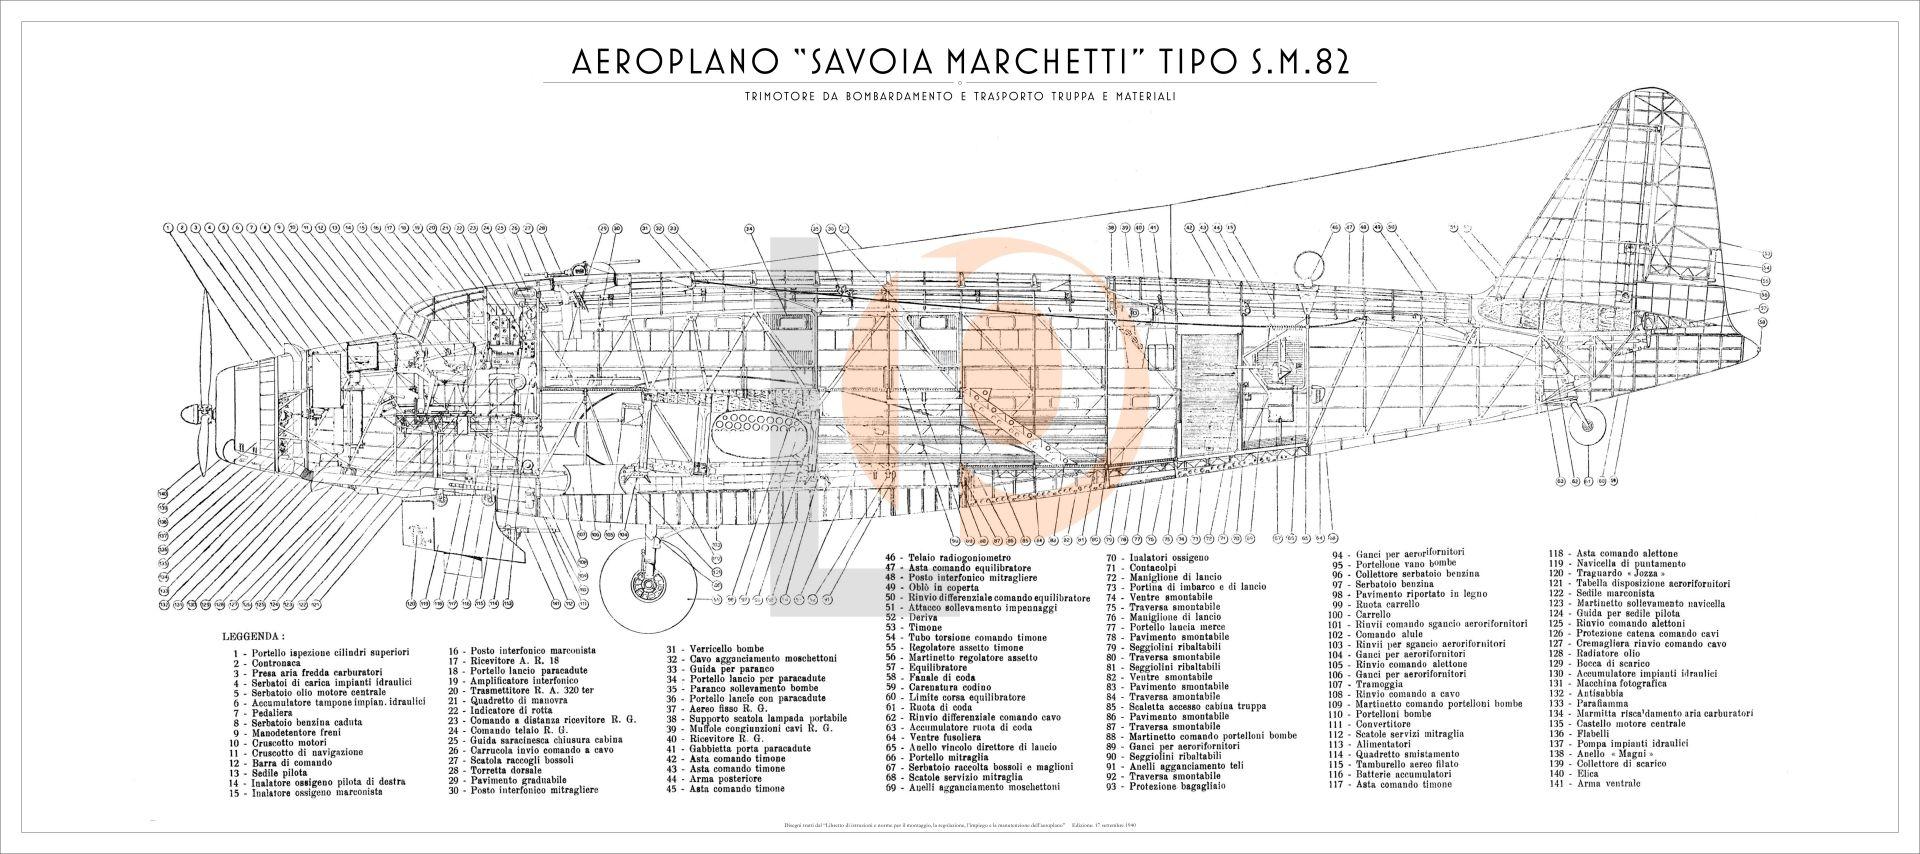 Bombe 94 dedans aeroplano s.i.a.i. marchetti sm.82-cod. sm82-126x56 fianco | flying